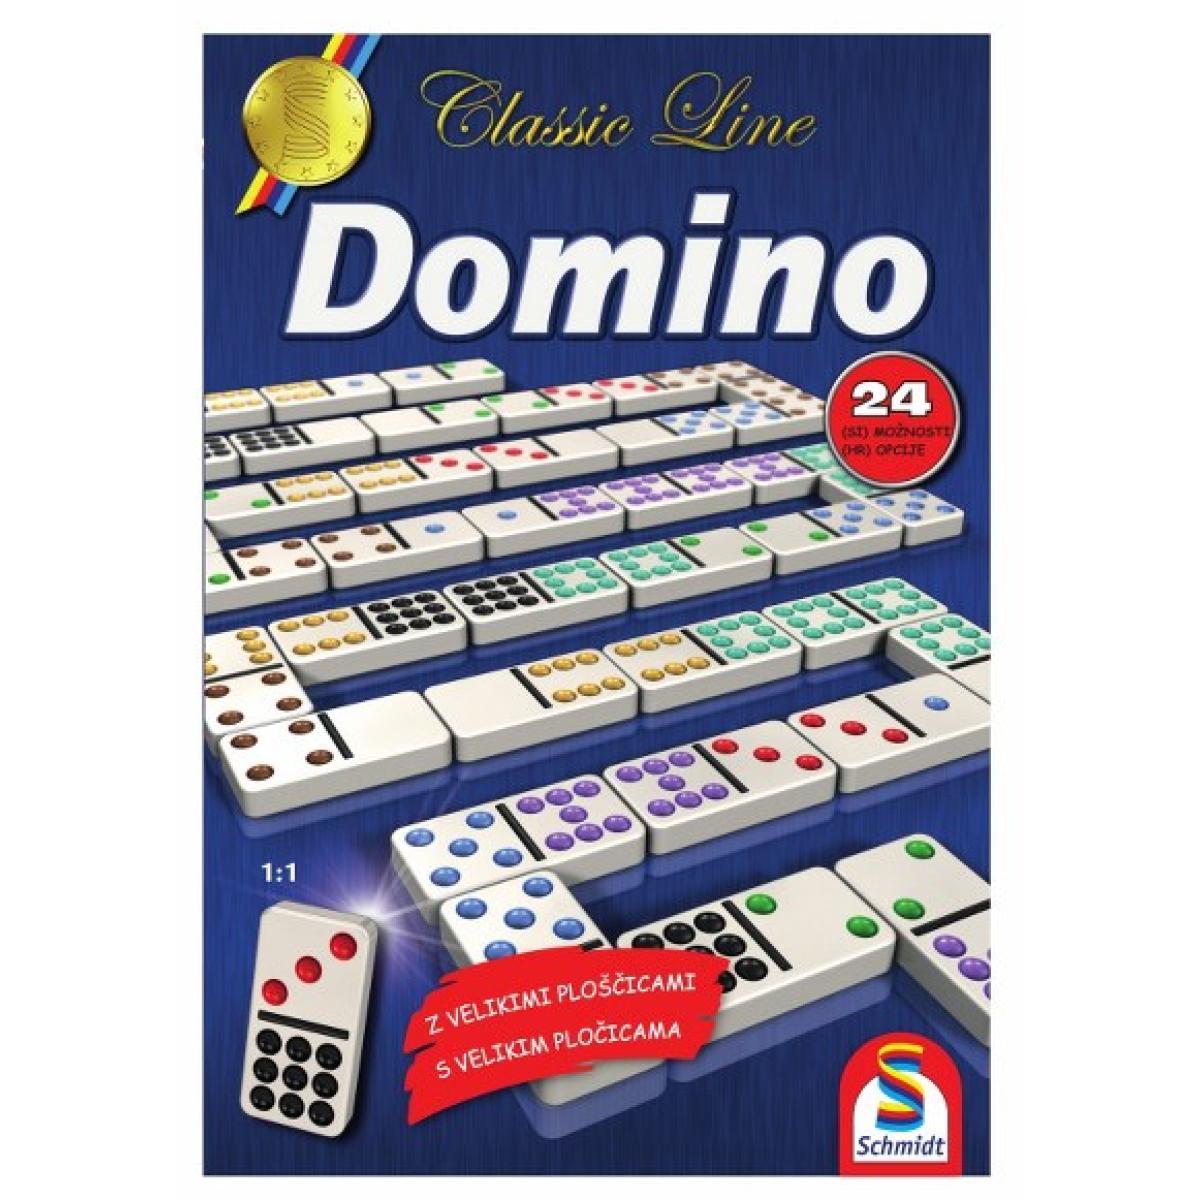 Schmidt Domino štiriindvajset različnih verzij igranja